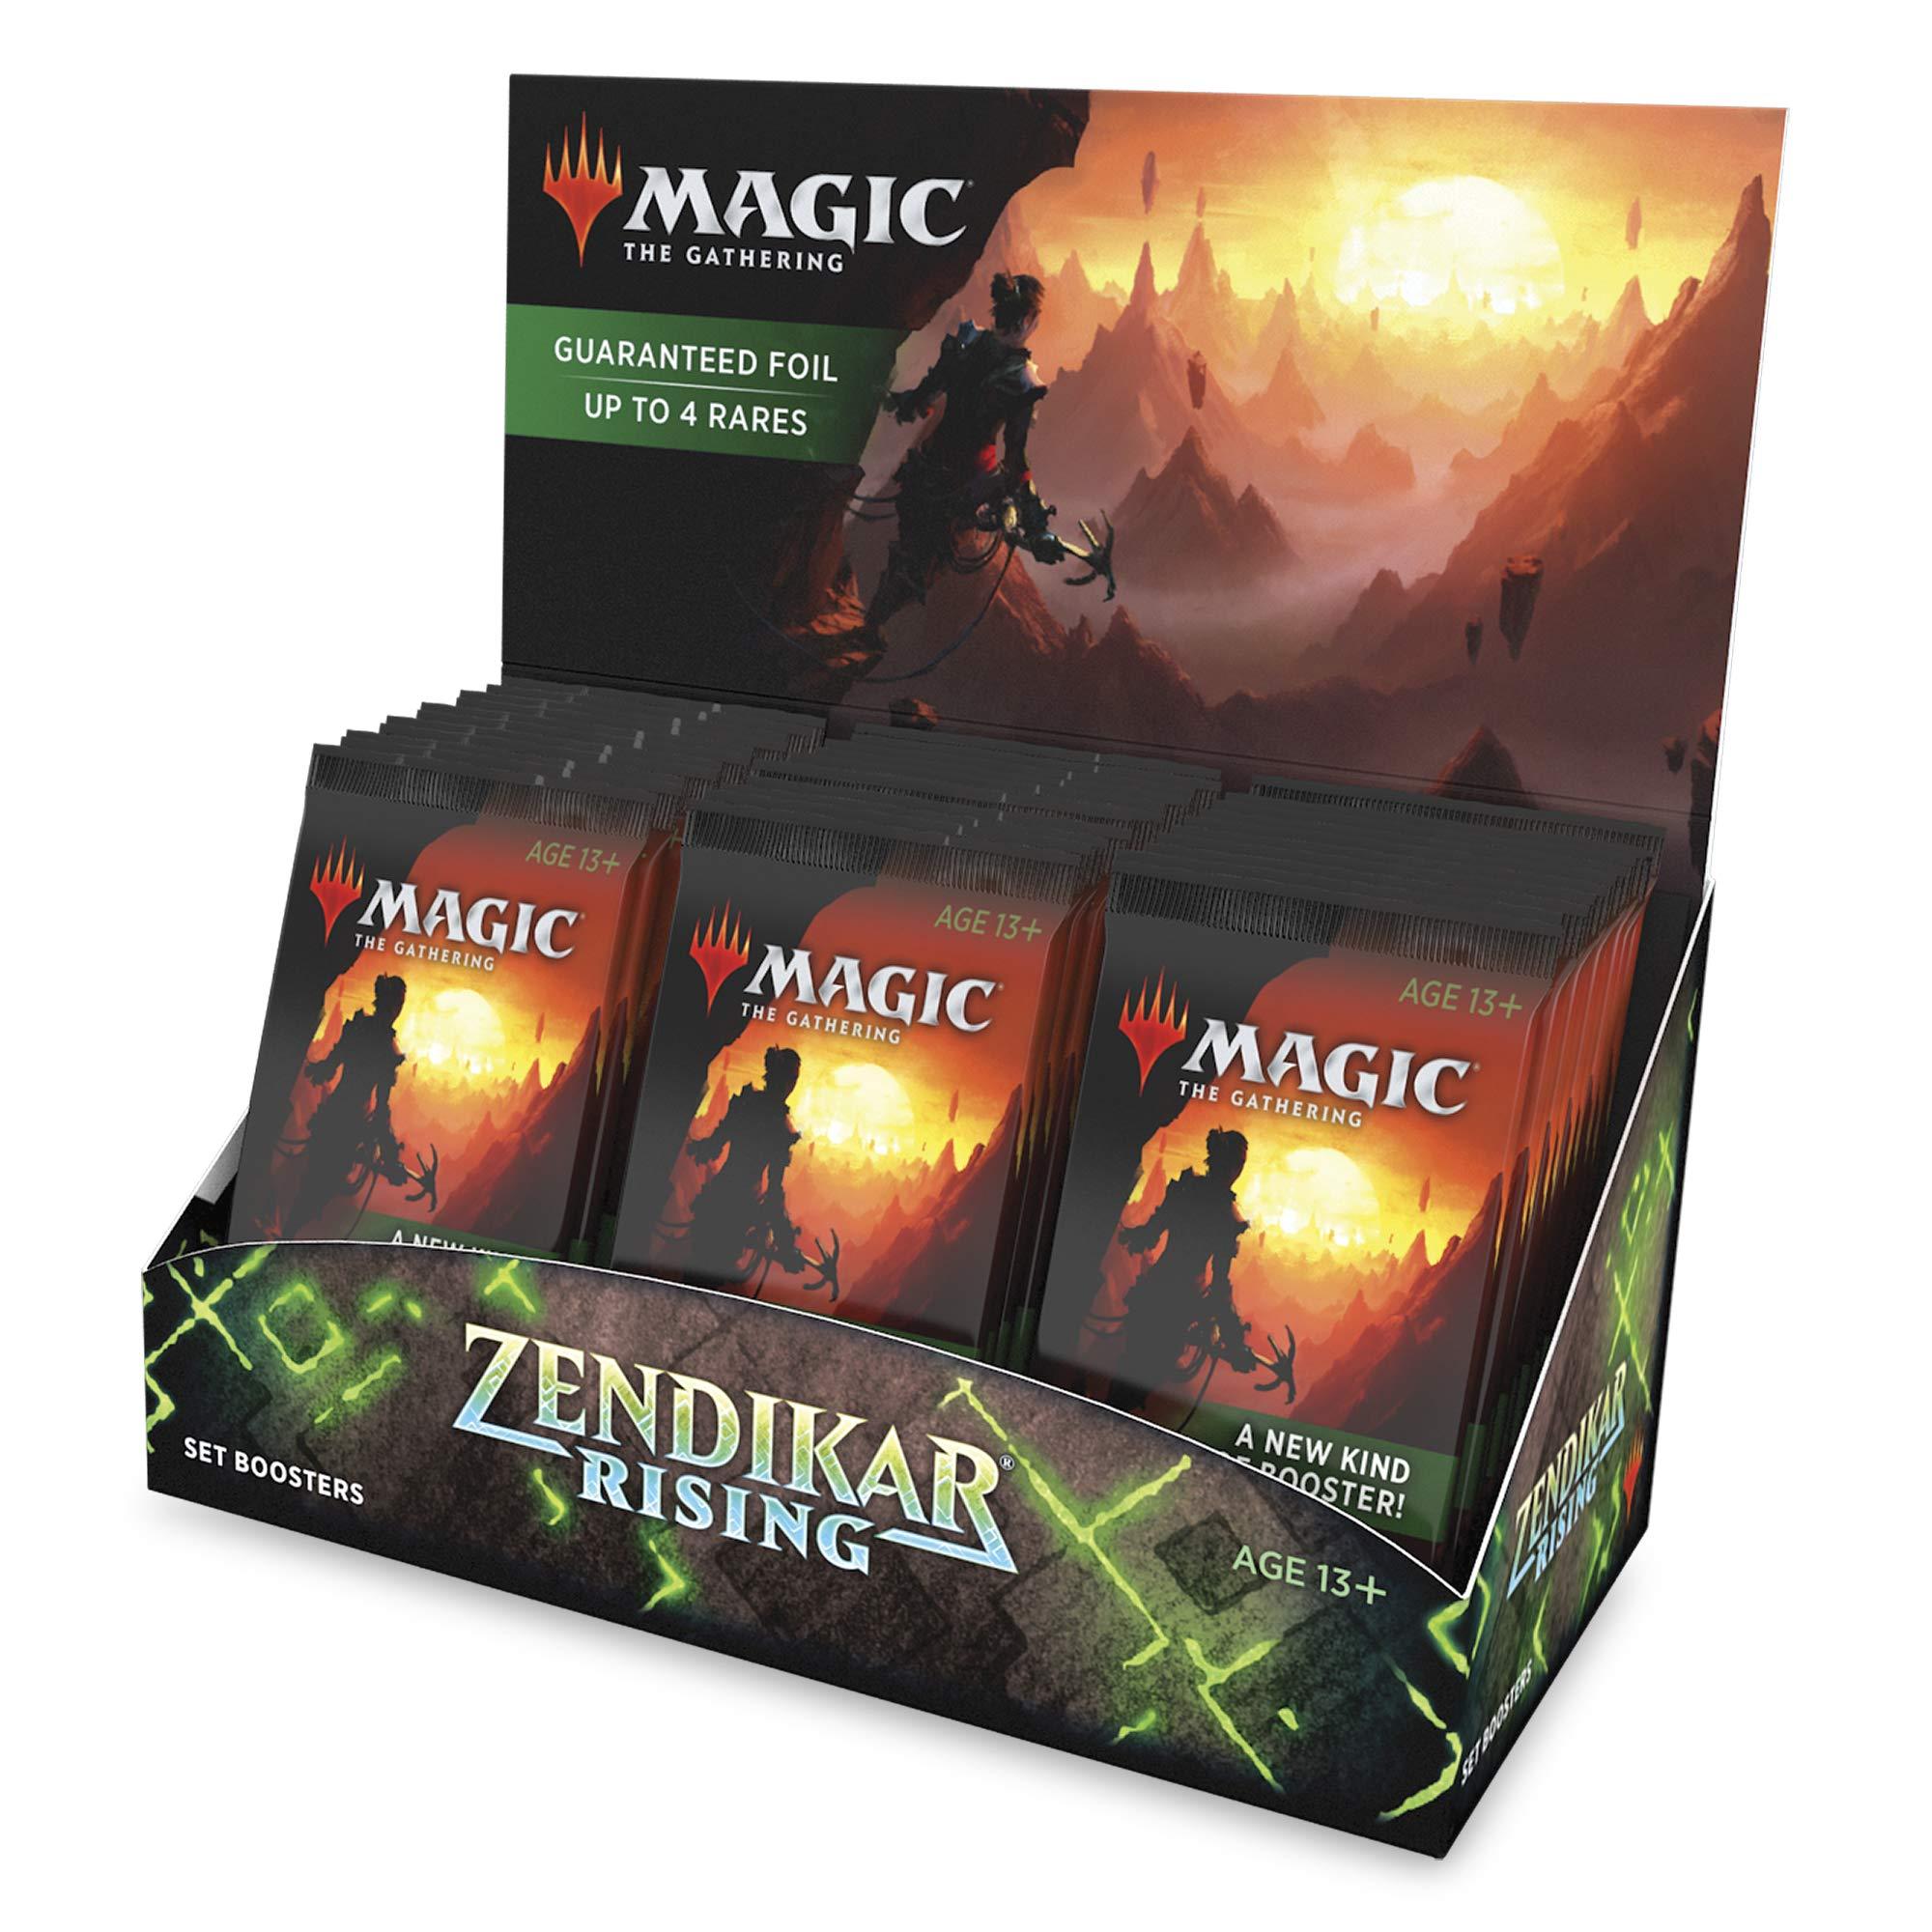 Magic: The Gathering Zendikar Rising Set Booster Box   30 Packs (360 Cards) + 1 Box Topper   Foil in Every Pack